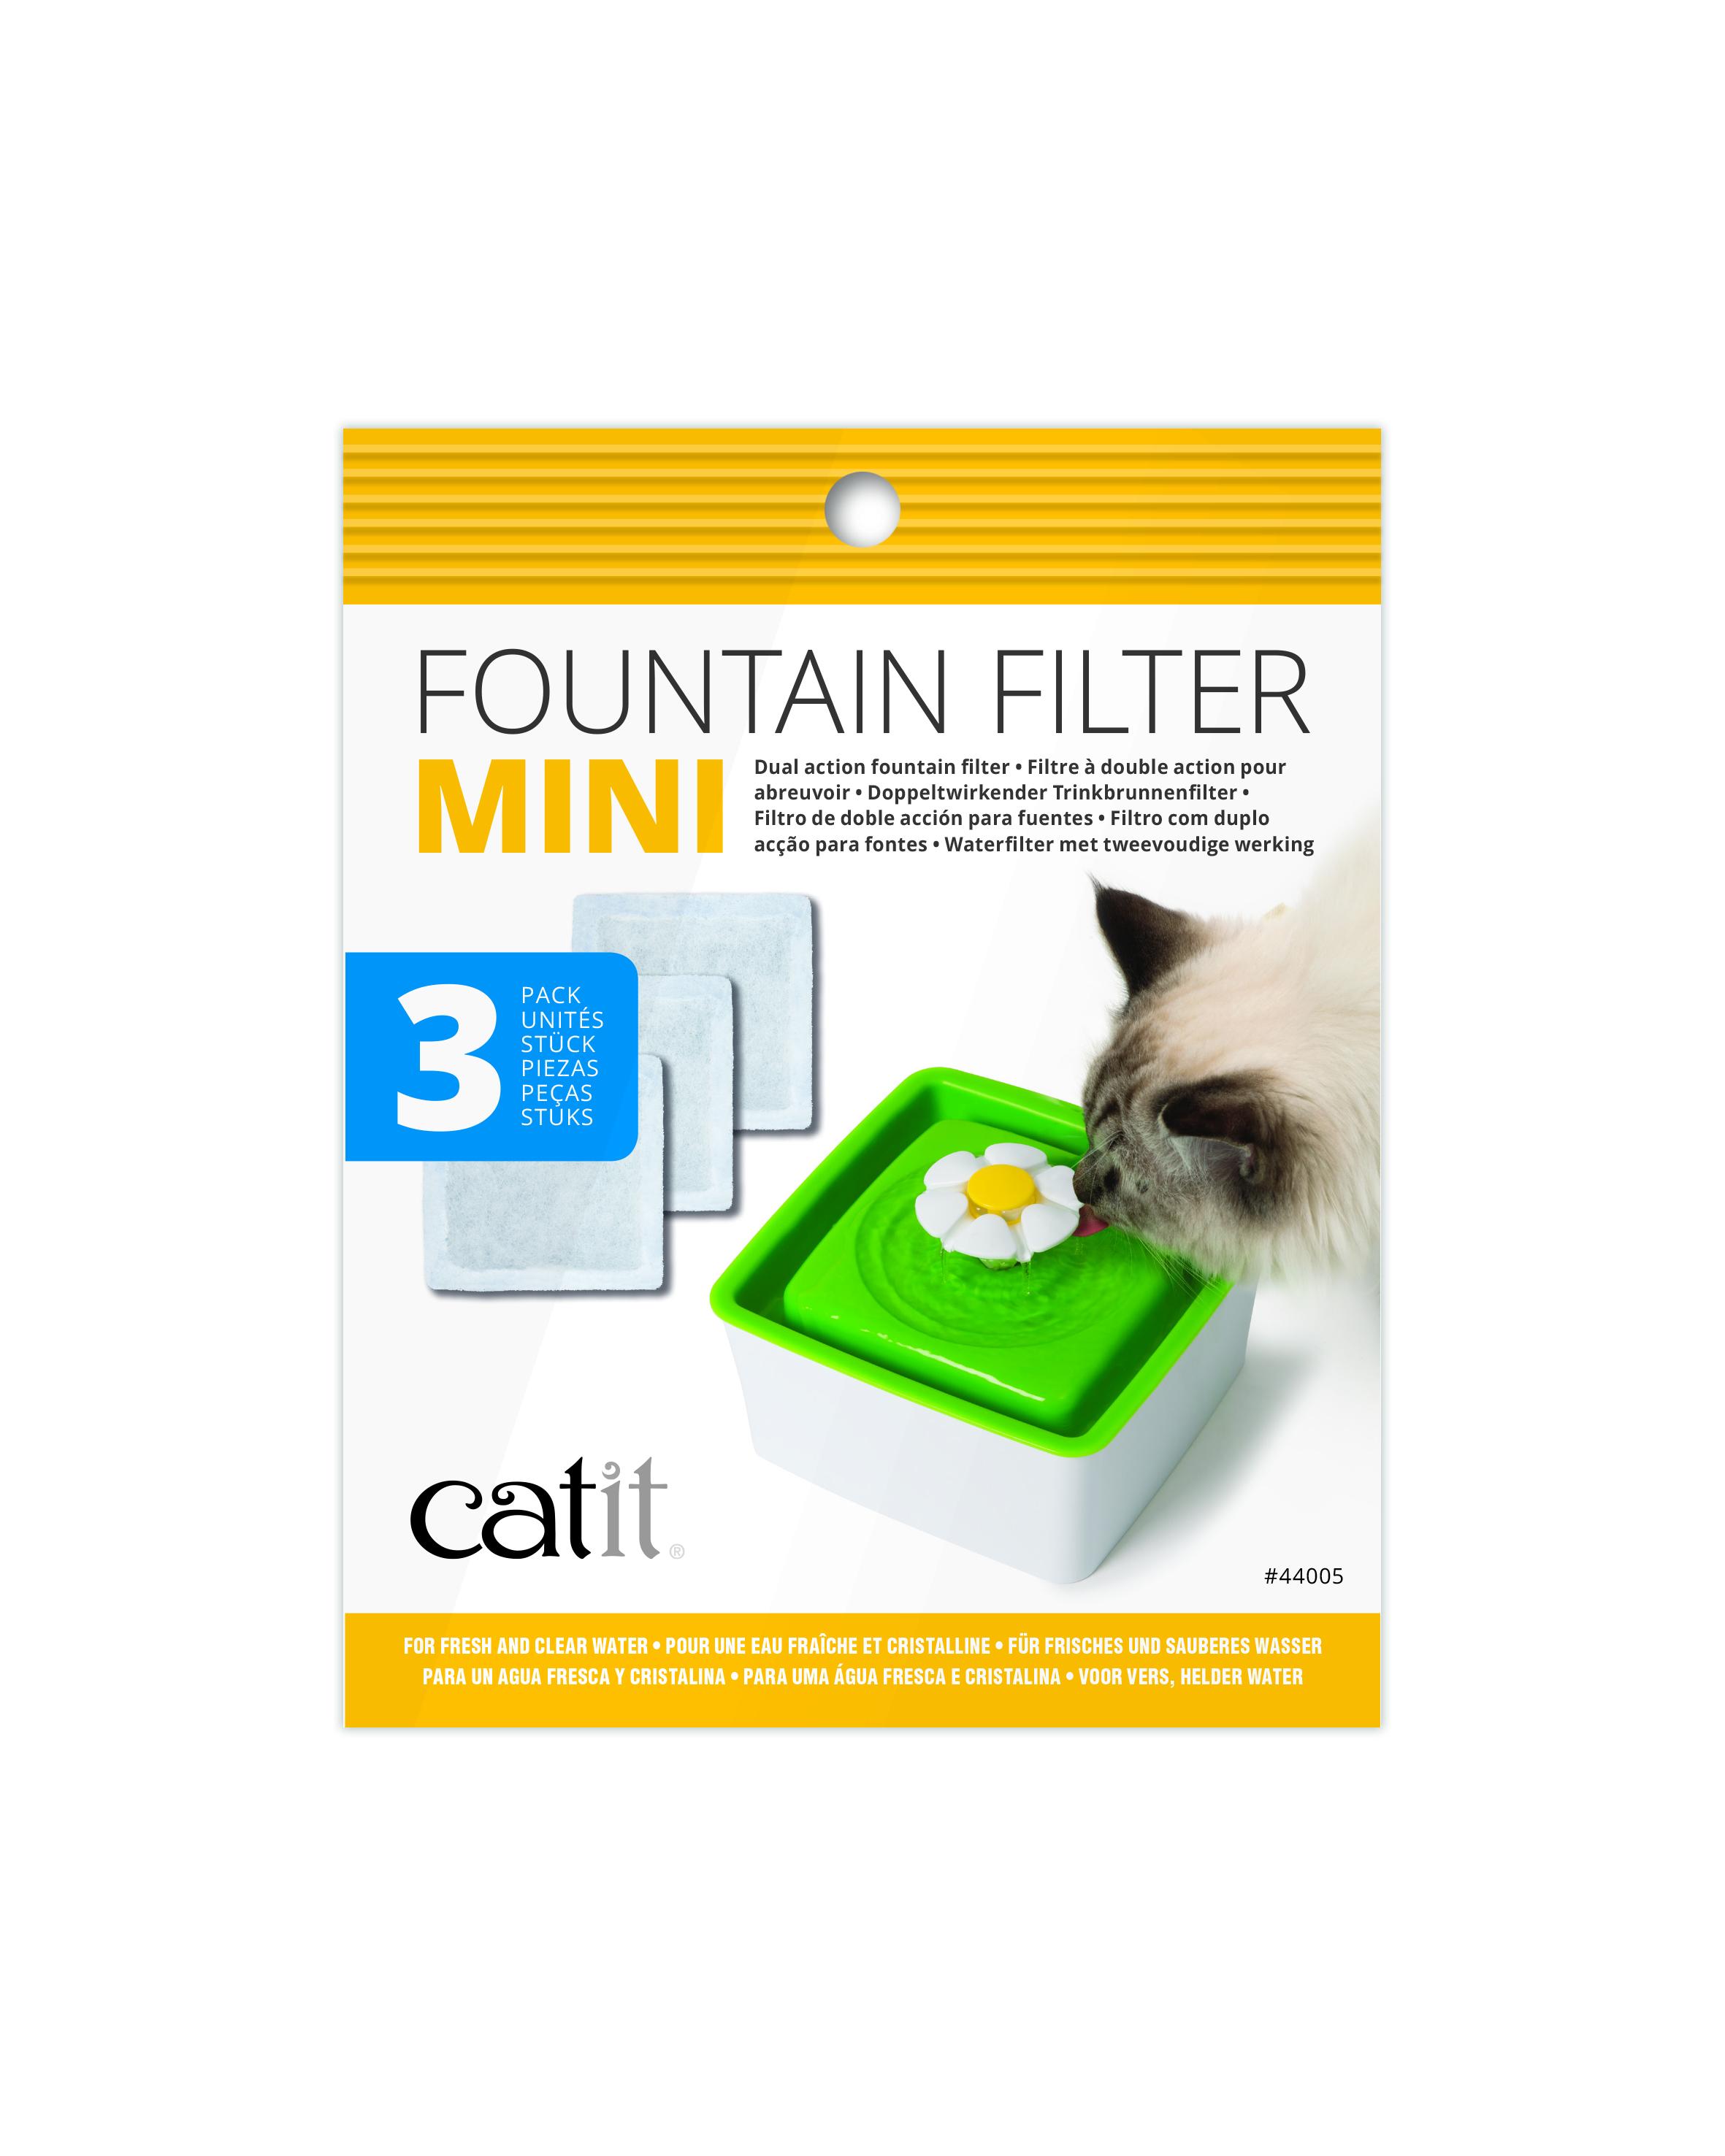 Hagen Catit 2.0 Ersatzfilter Mini 3er-Pack